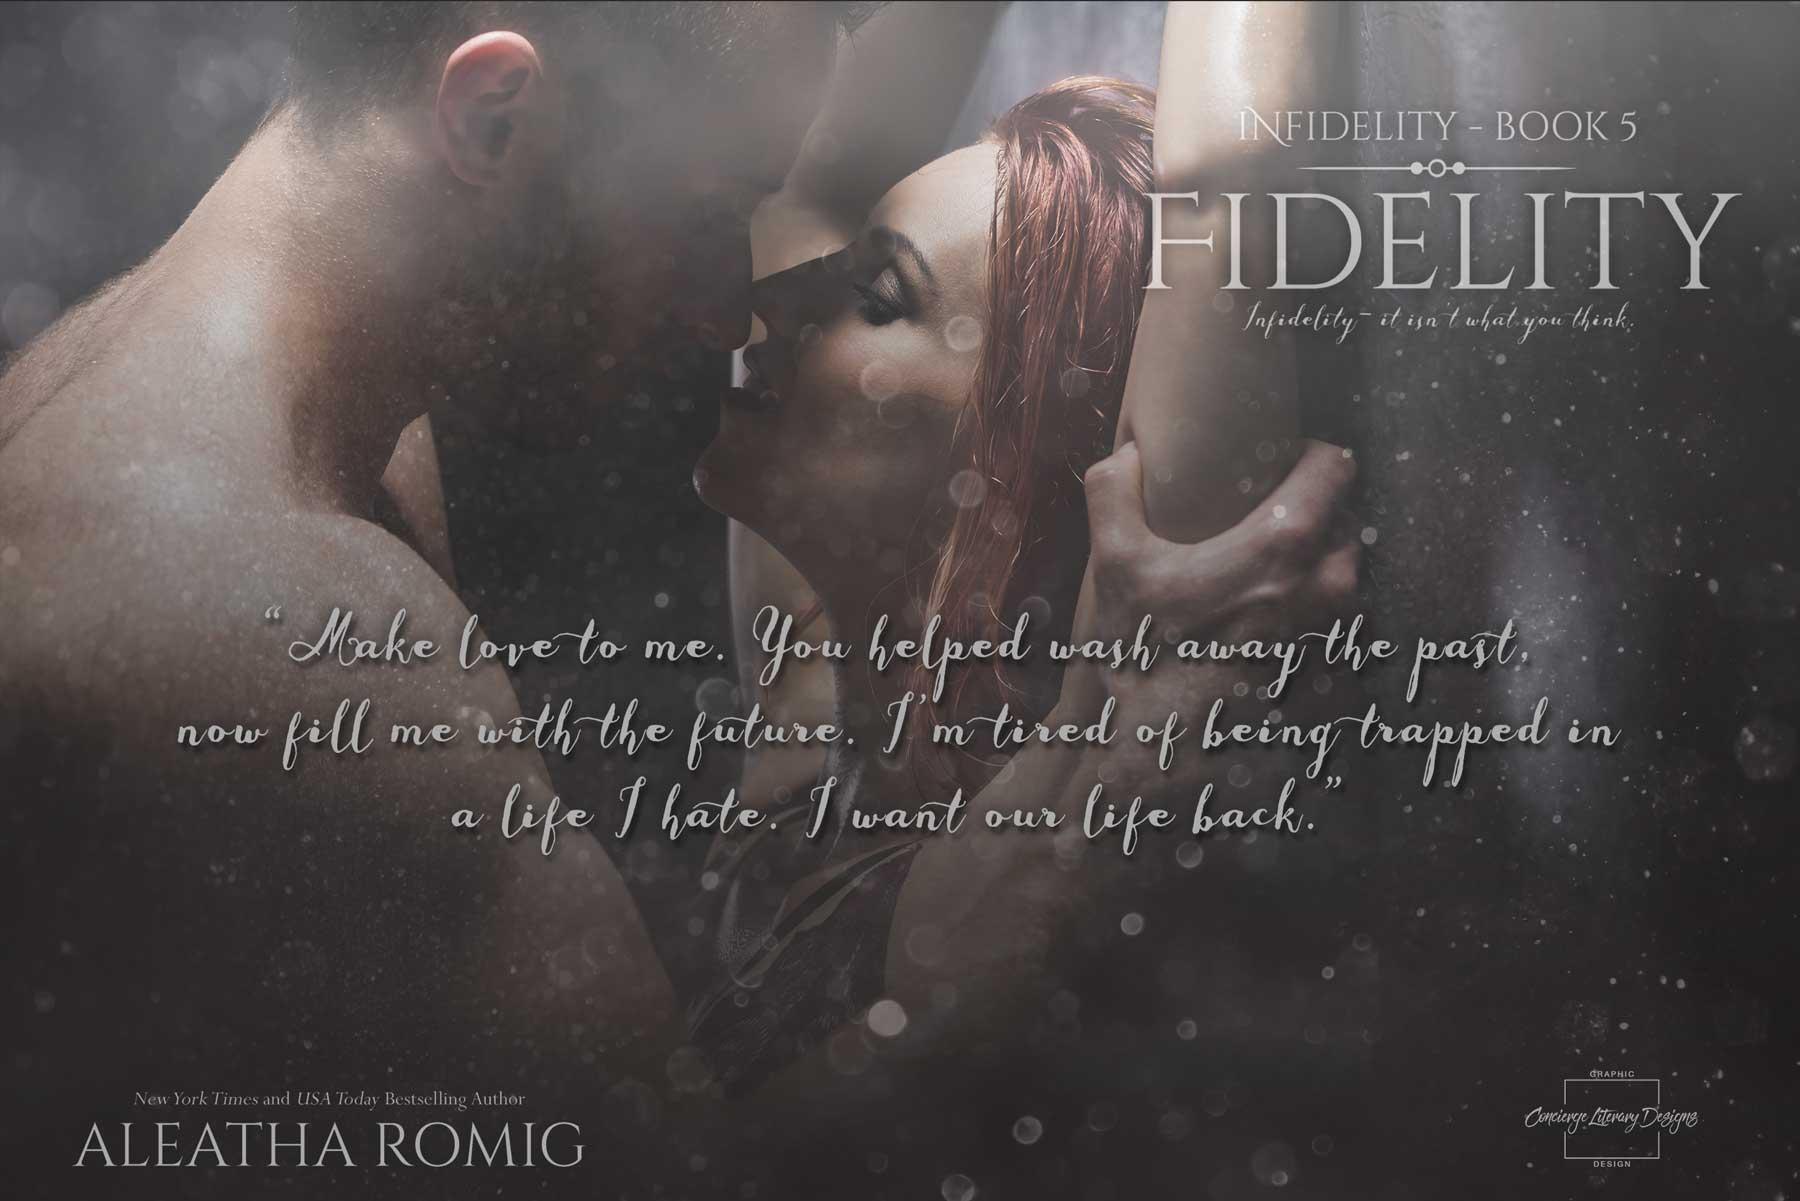 FIDELITY---MAKE-LOVE-TO-ME (1).jpg